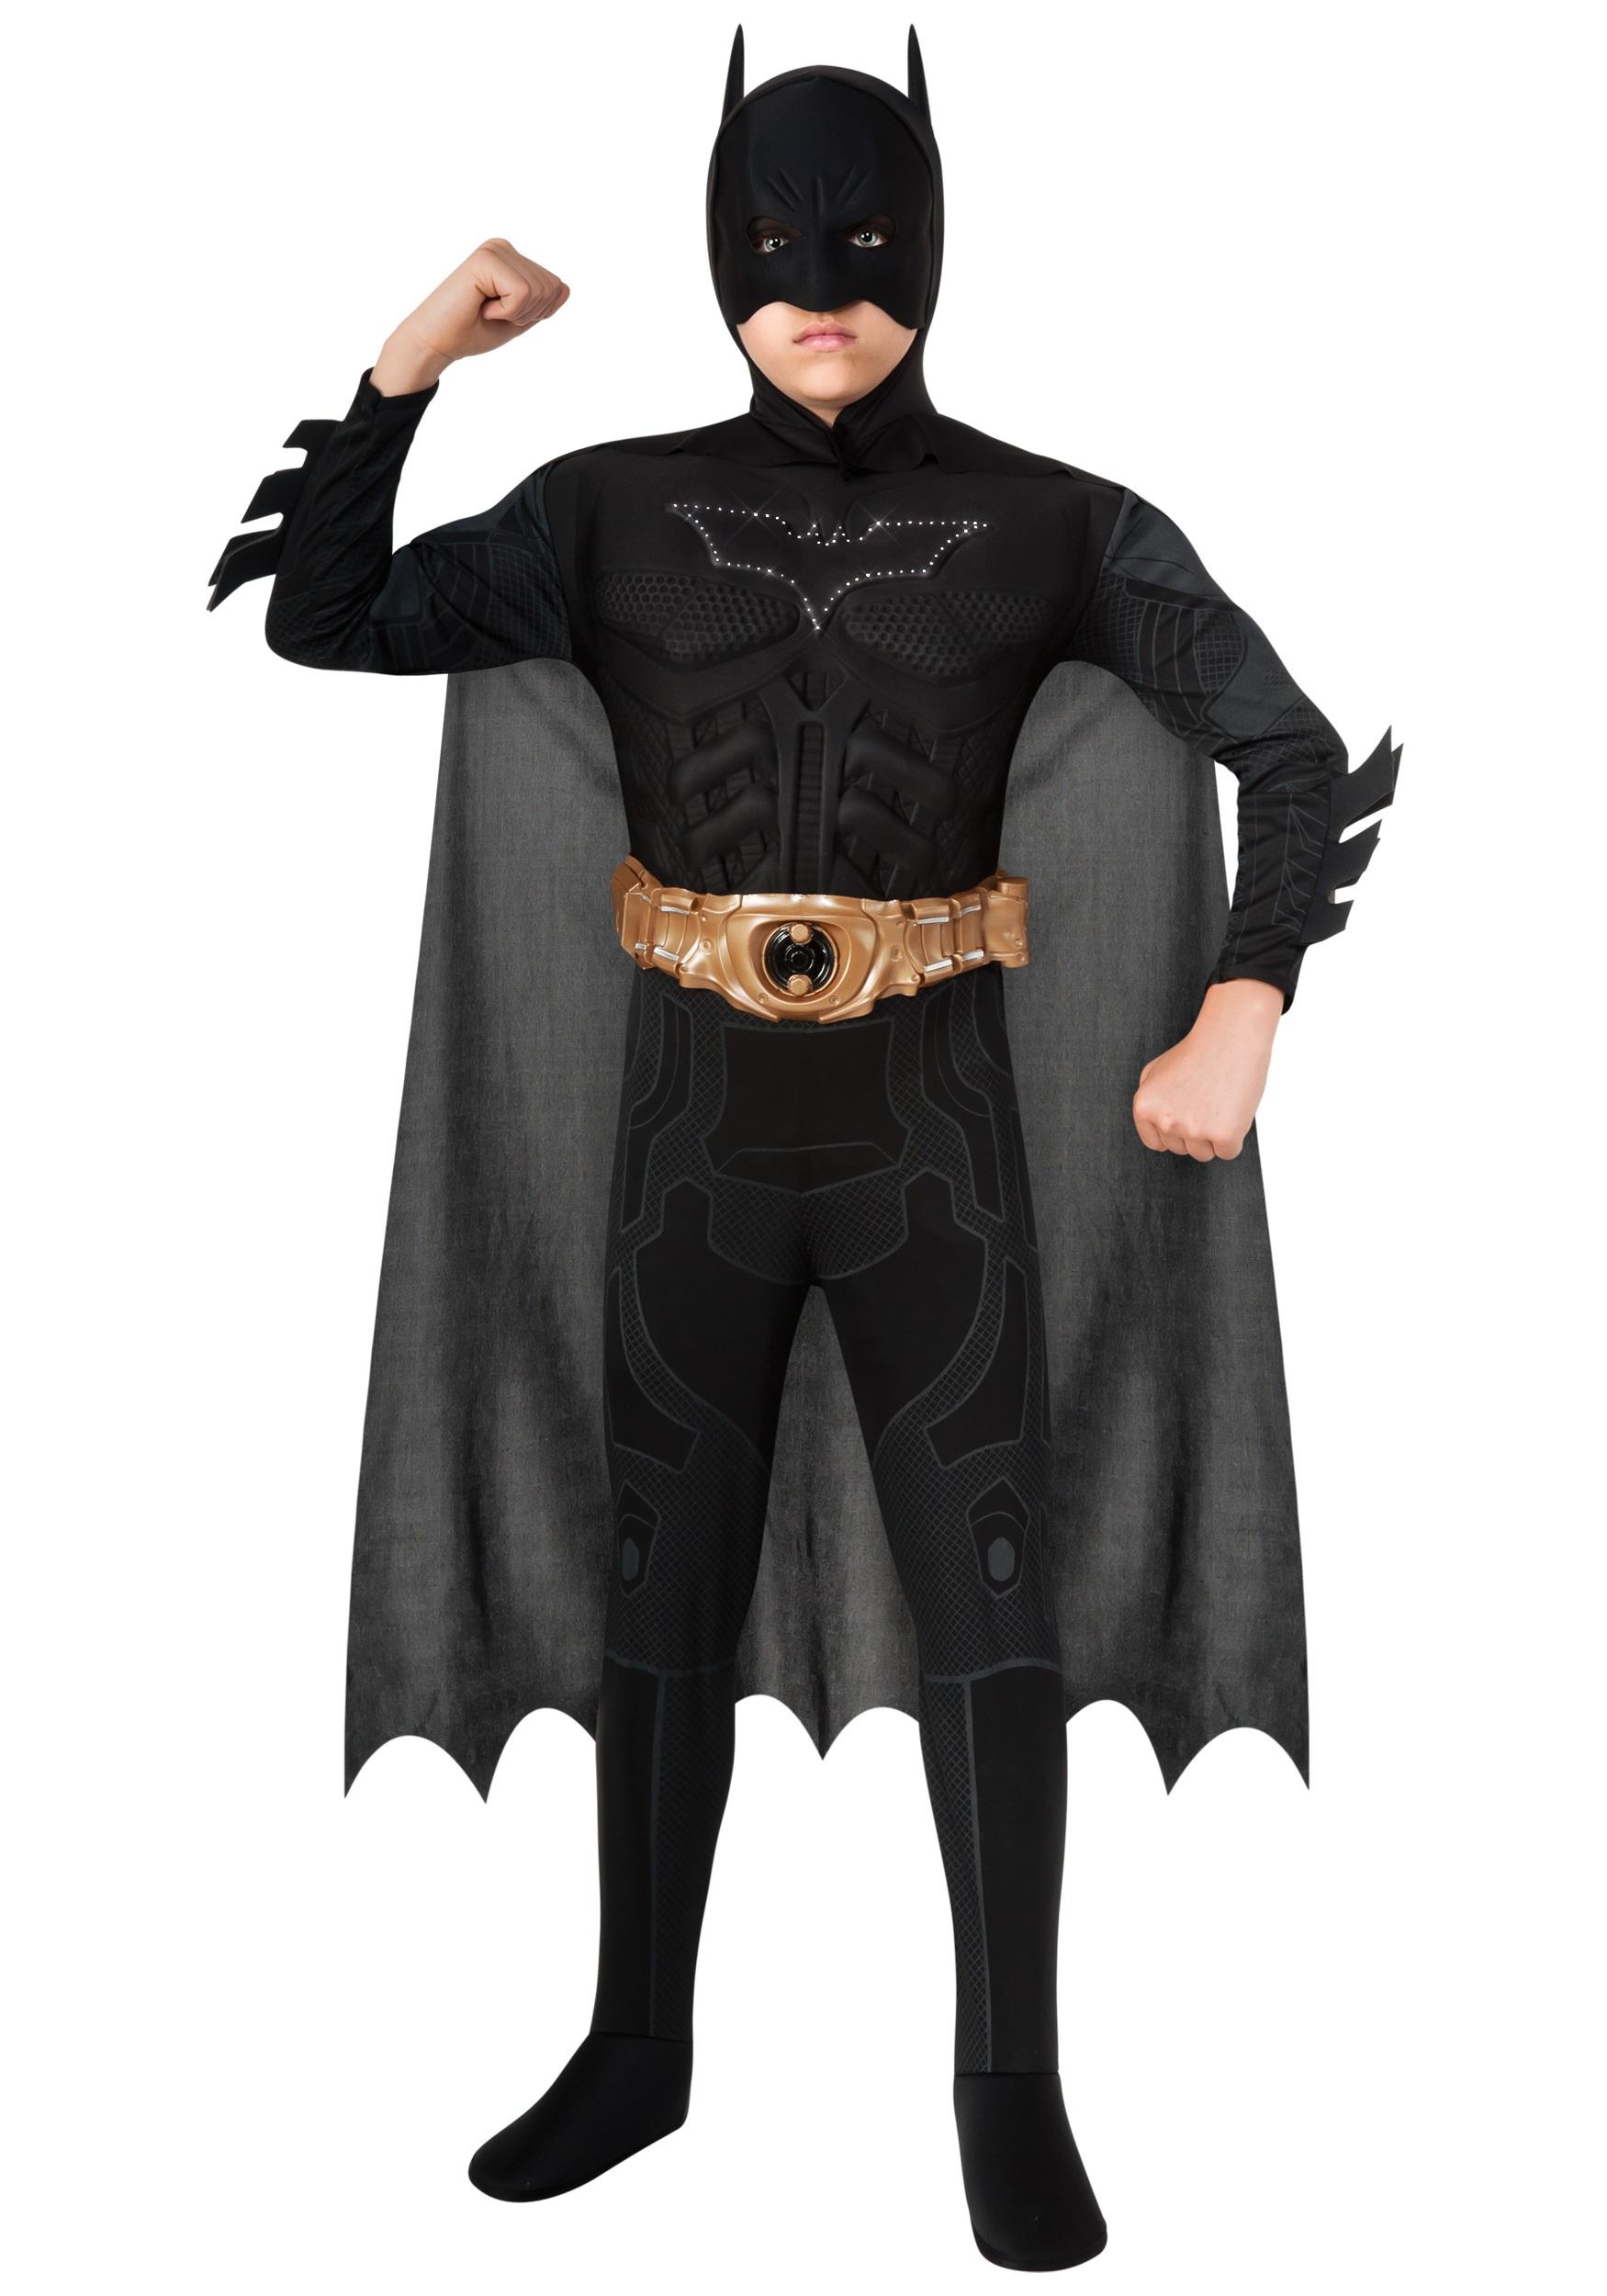 Batman Costumes & Suits For Halloween - HalloweenCostumes.com